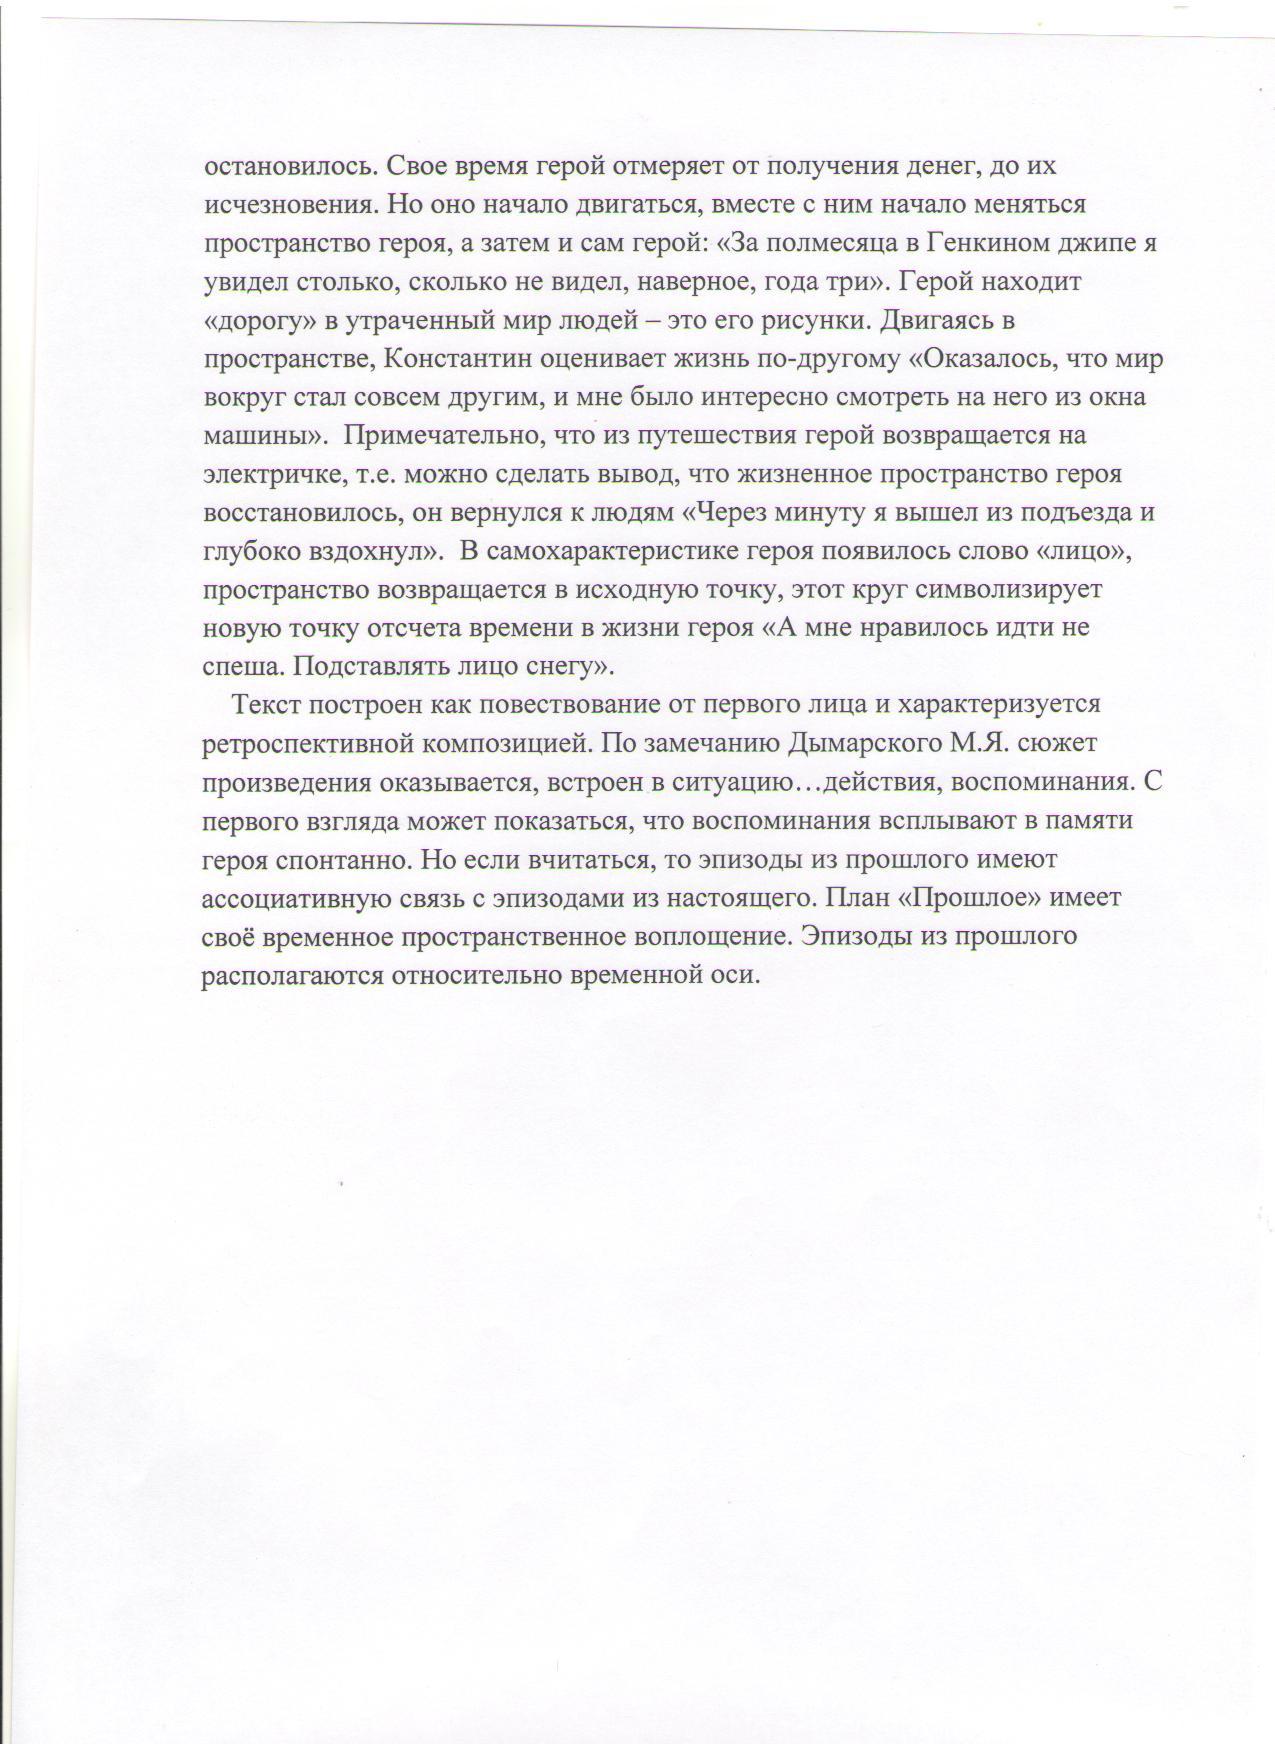 C:\Documents and Settings\Иван\Рабочий стол\gtlcjdtn\изображение 007.jpg